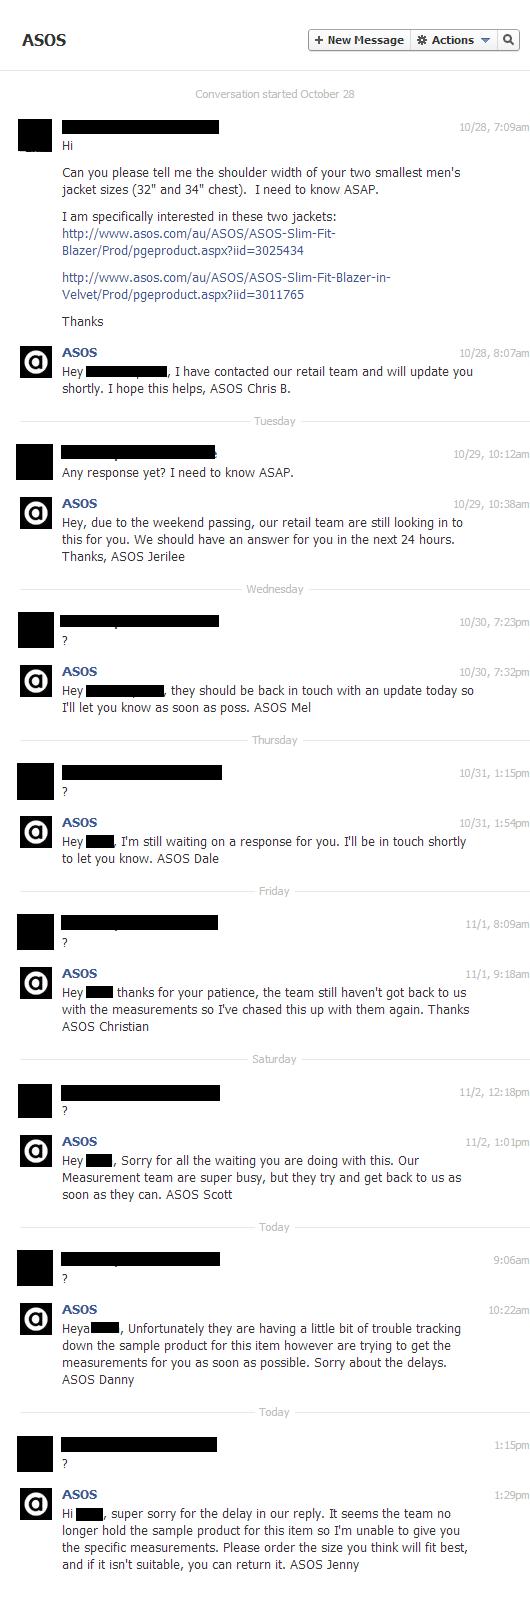 Asos.com Customer Service